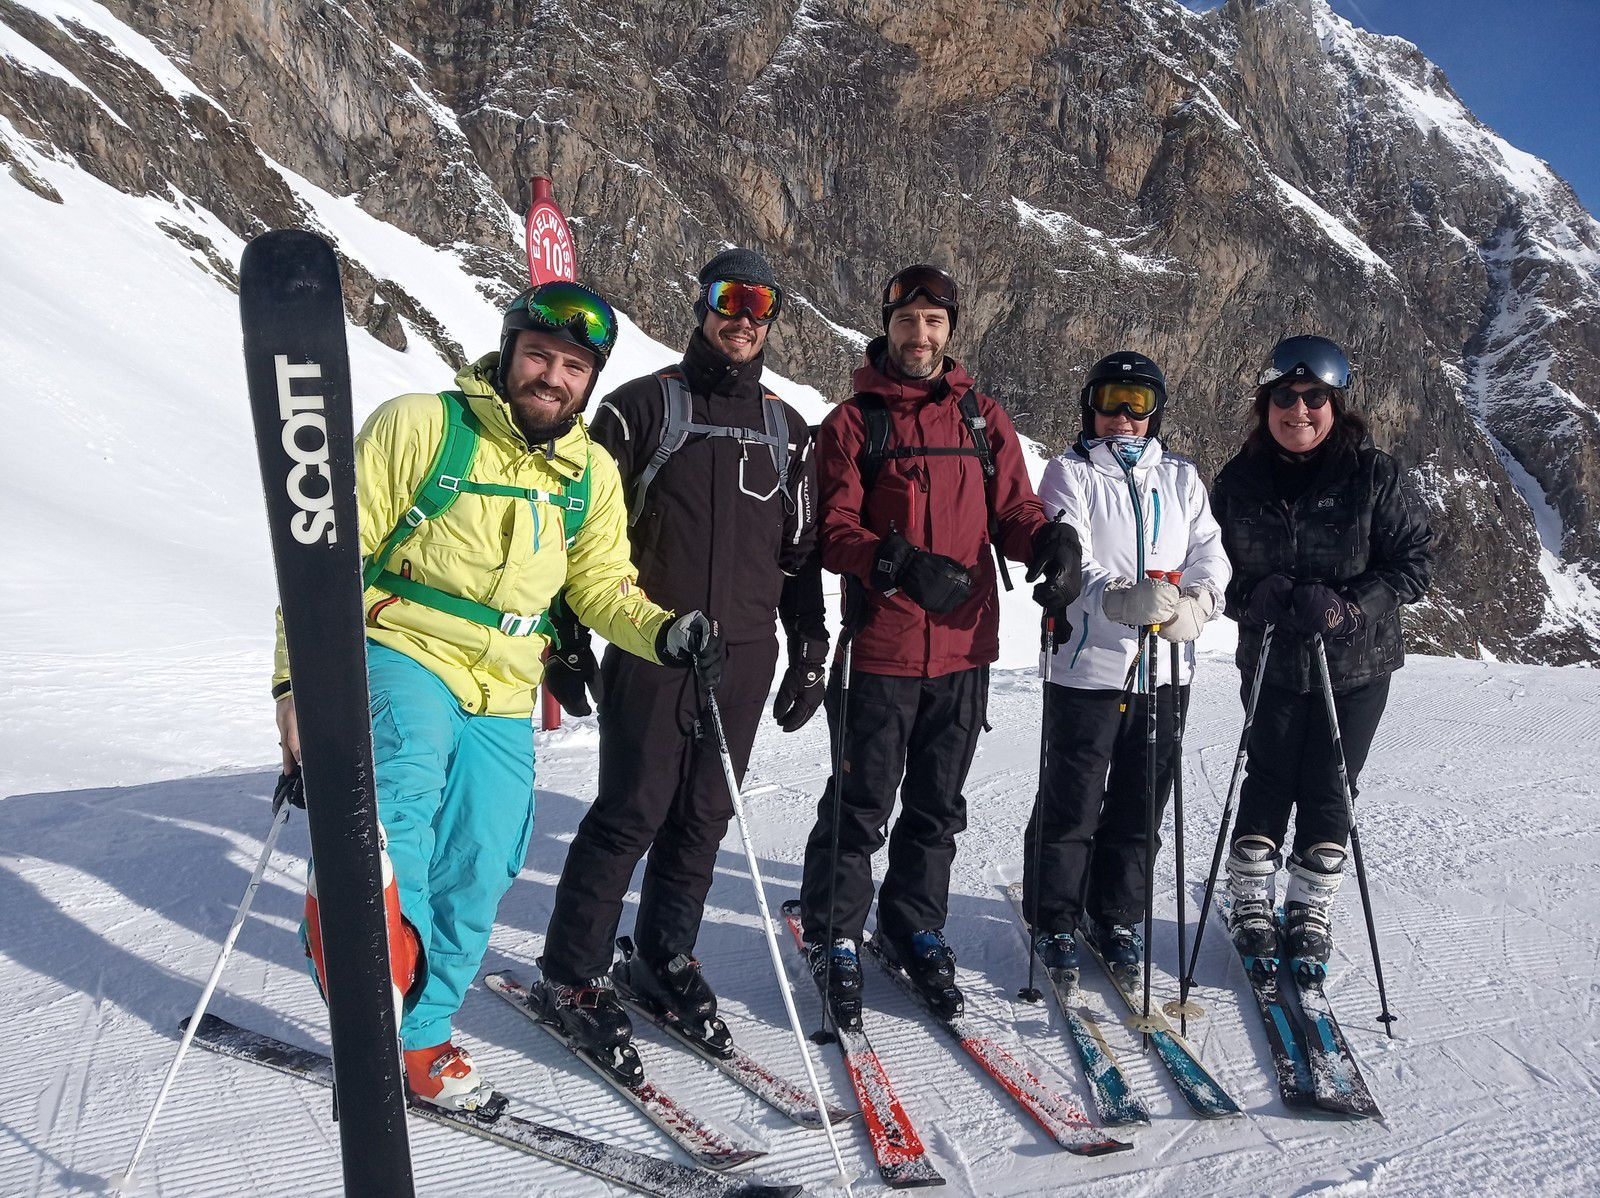 Séjour ski - jour 2